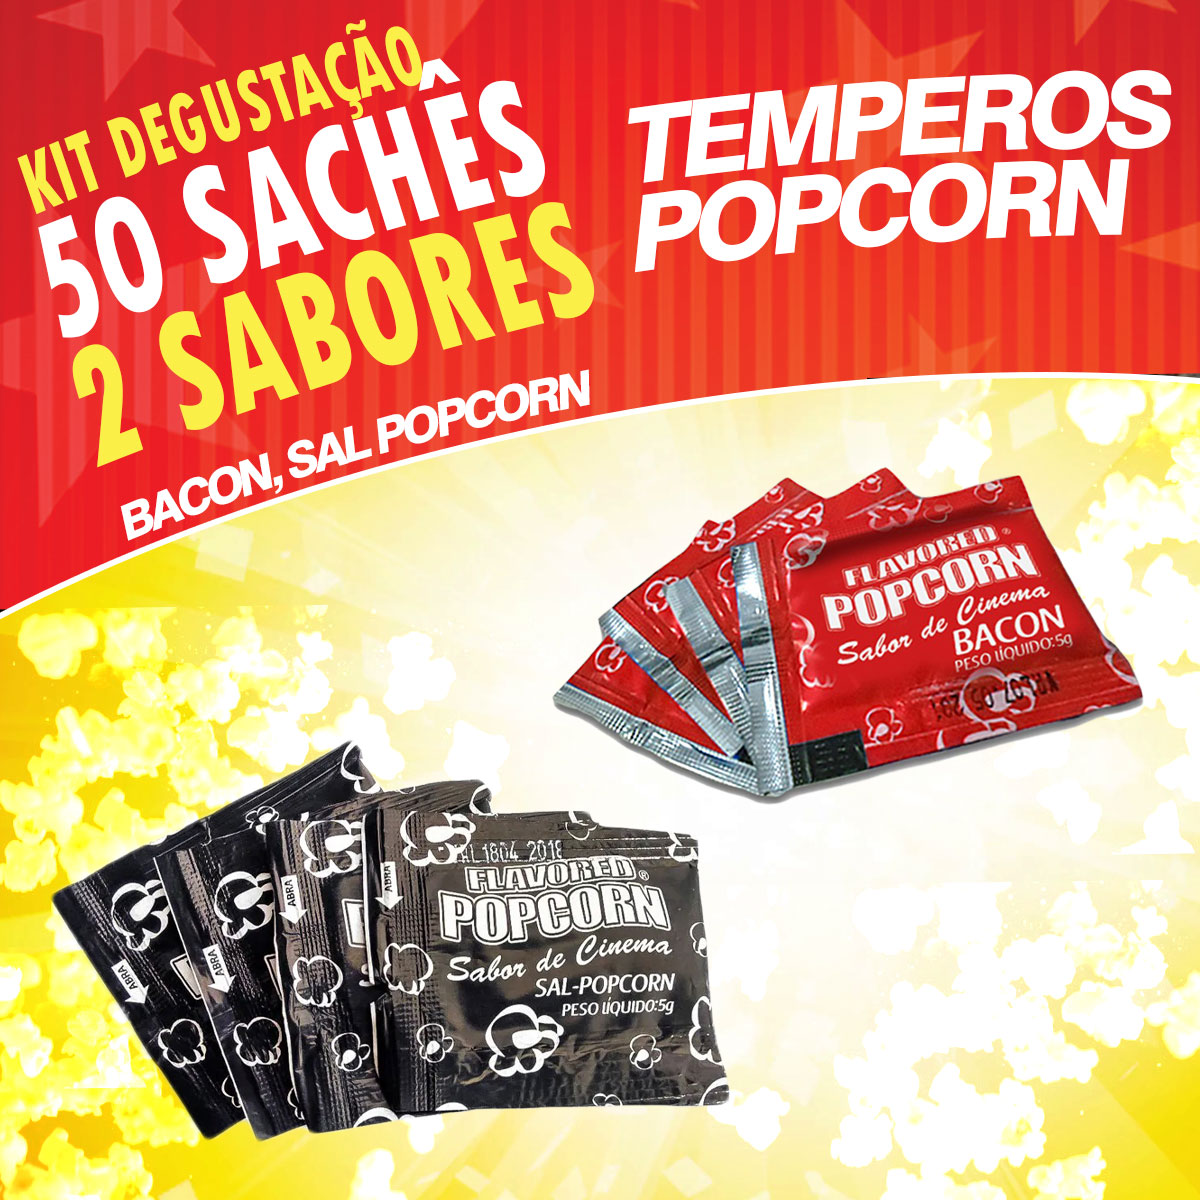 Temperos Popcorn 50 sachês. 25 Bacon e 25 Sal Popcorn.